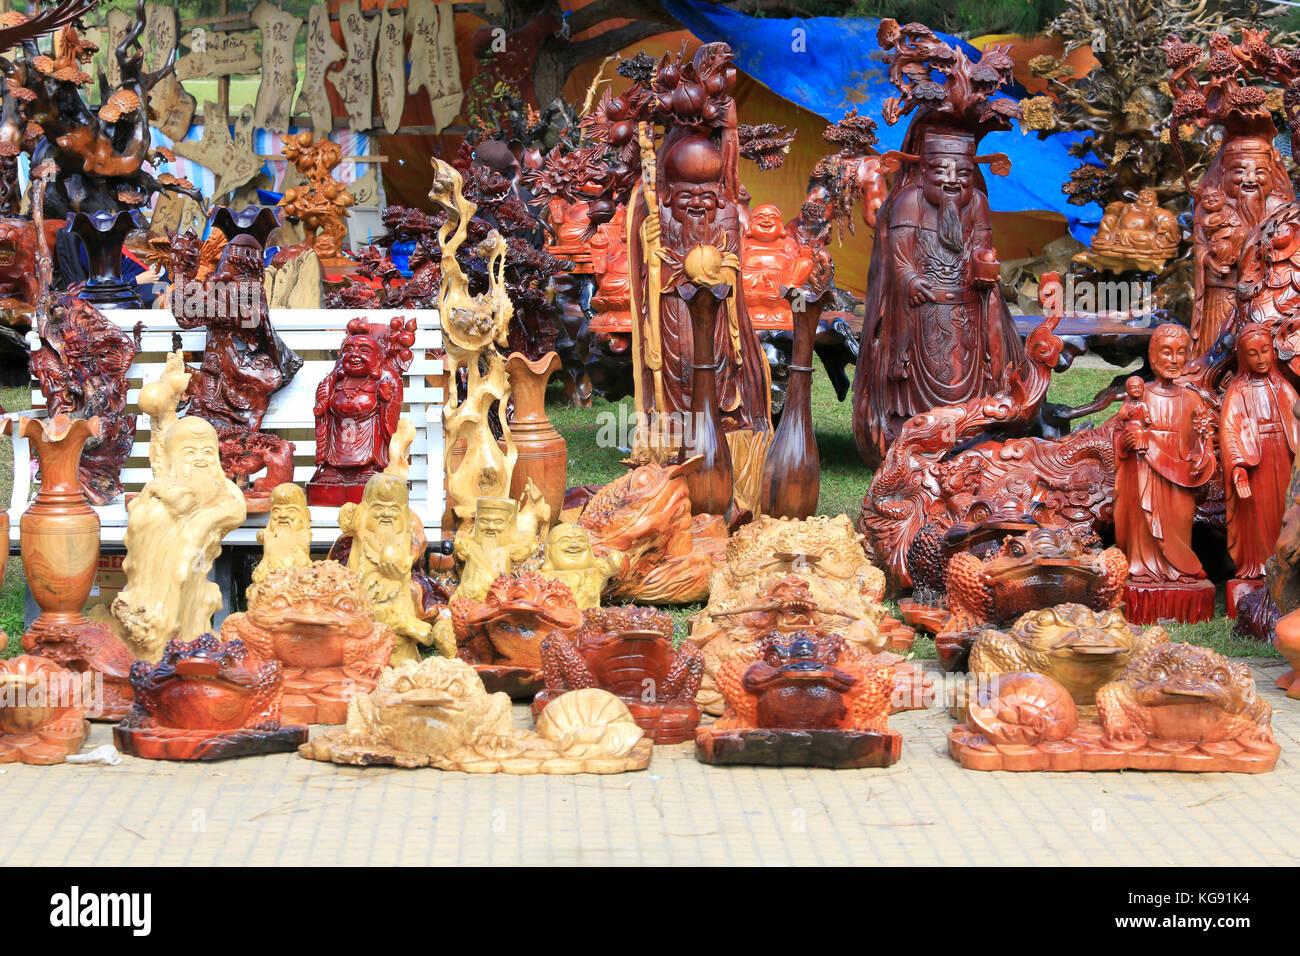 Woodcraft thailand stock photos